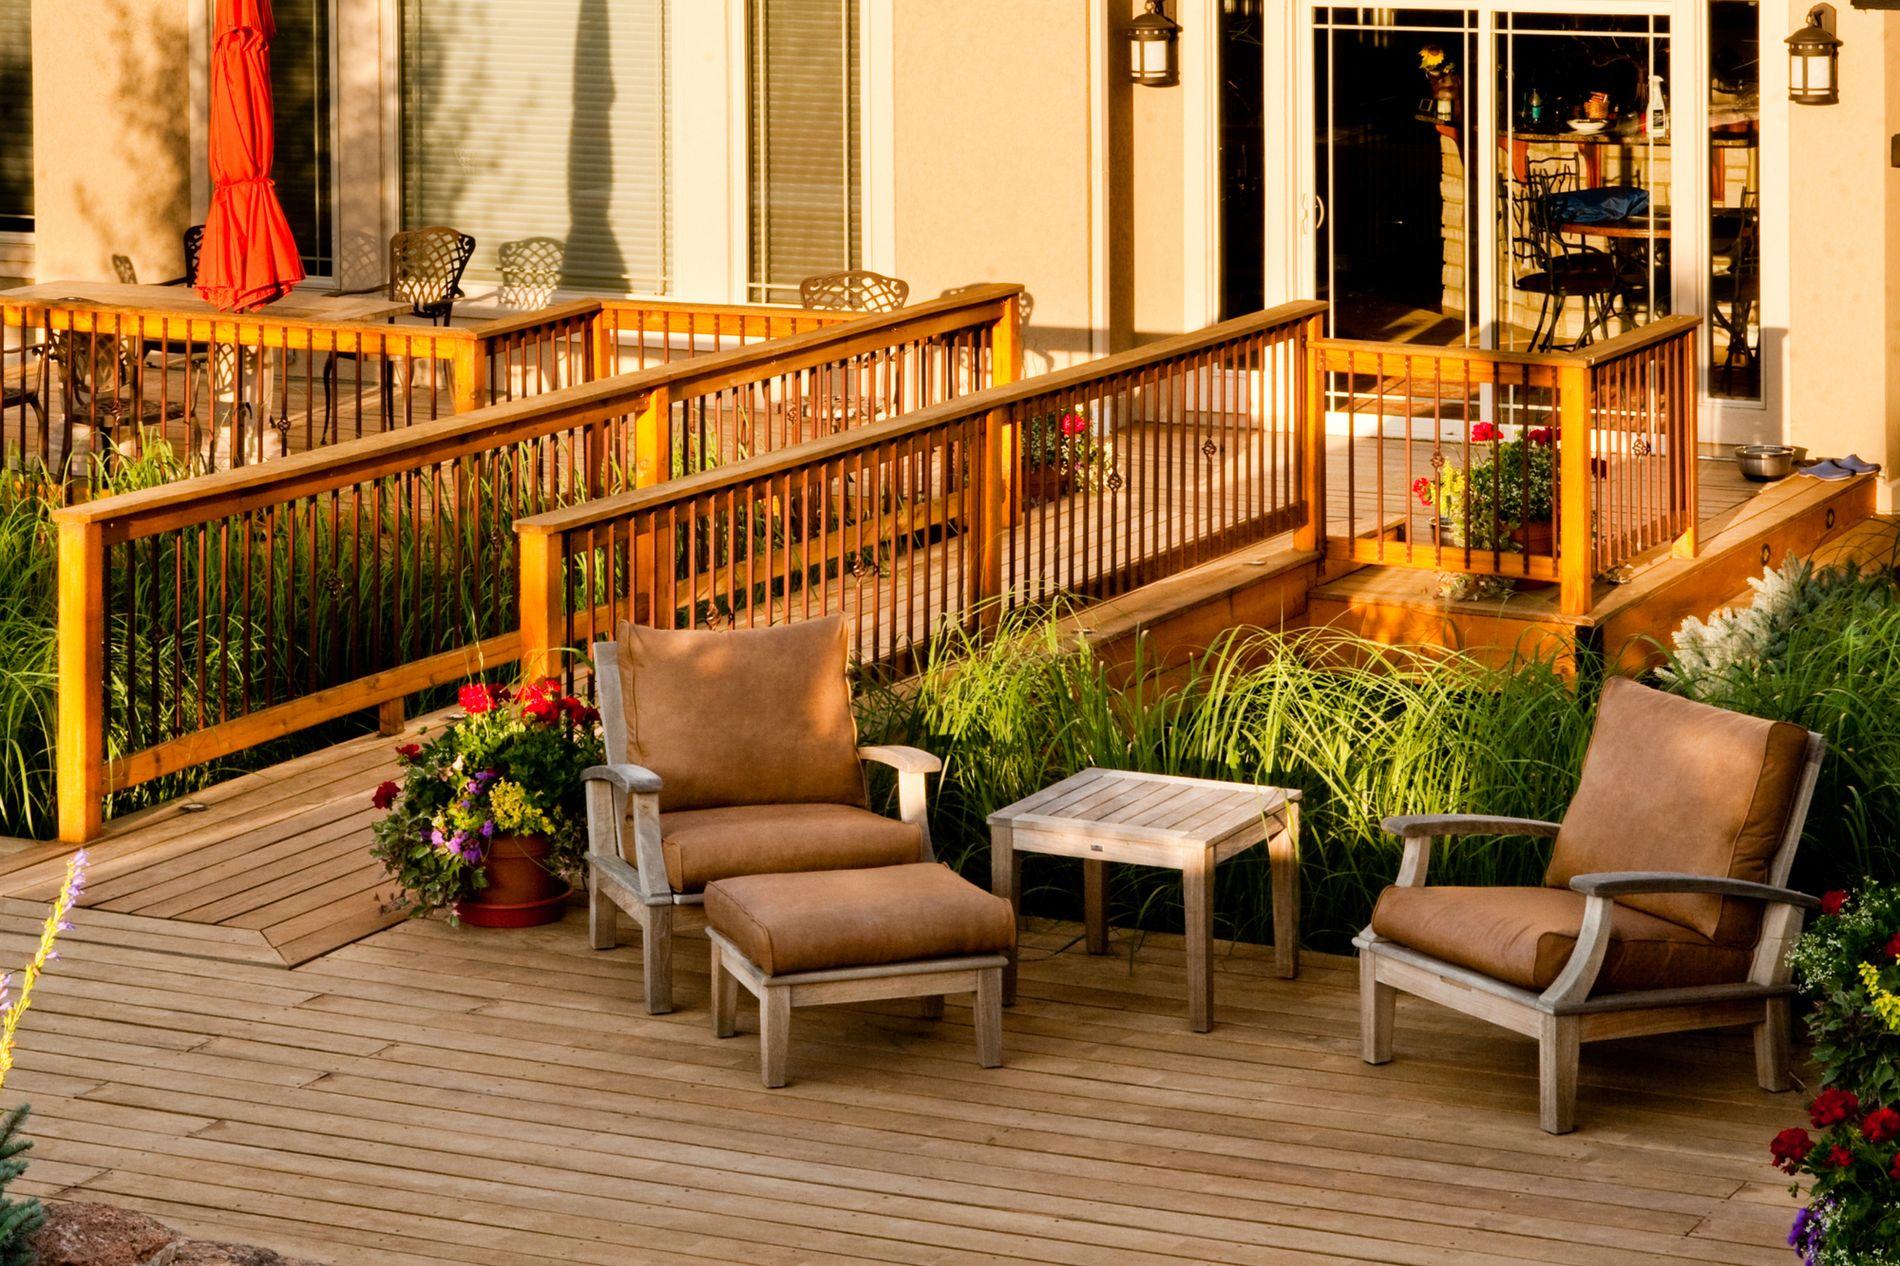 Wood deck with bridge